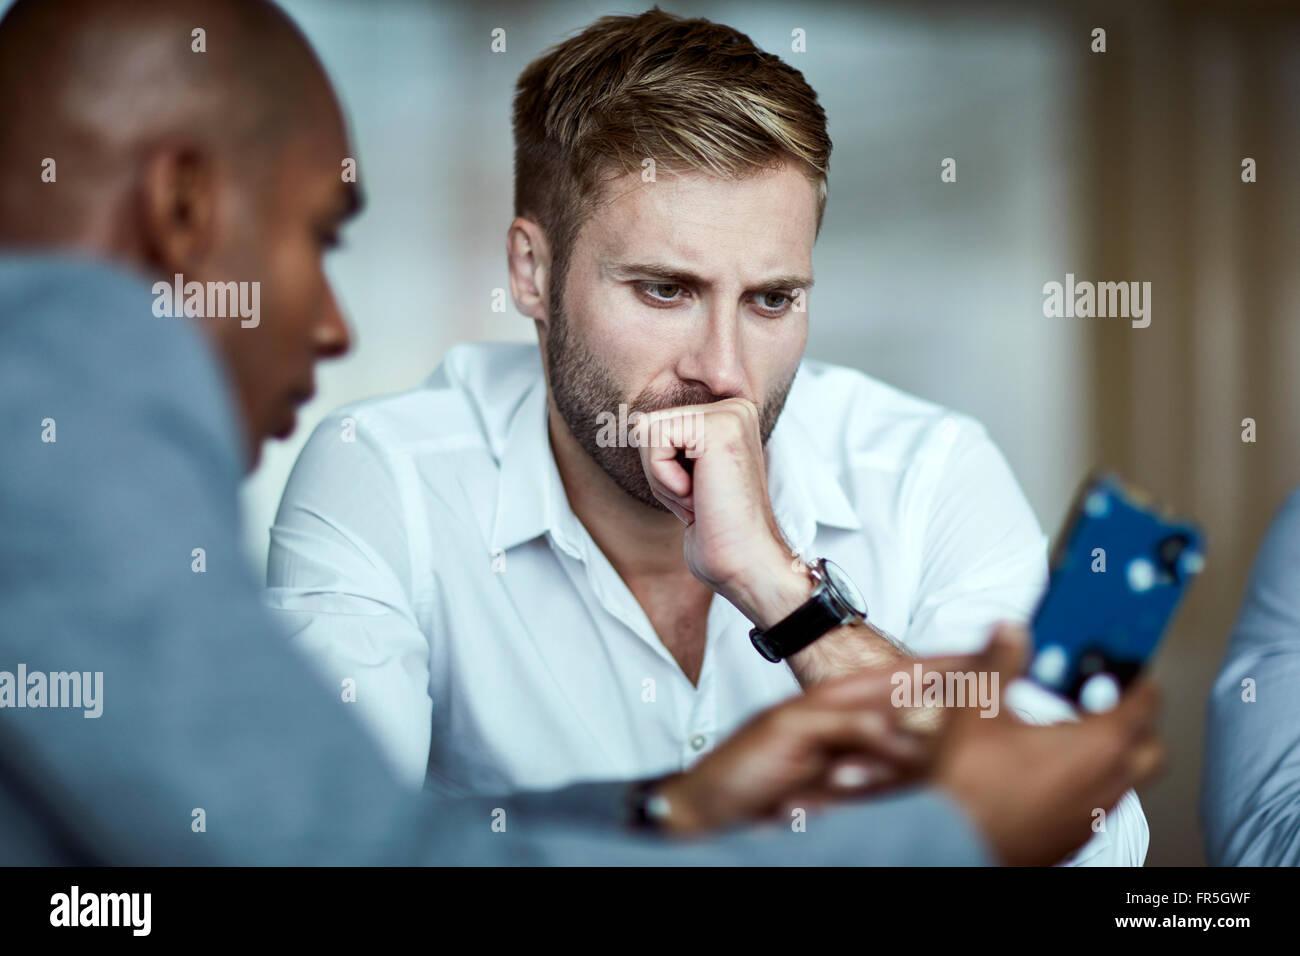 Serious businessmen examining part - Stock Image